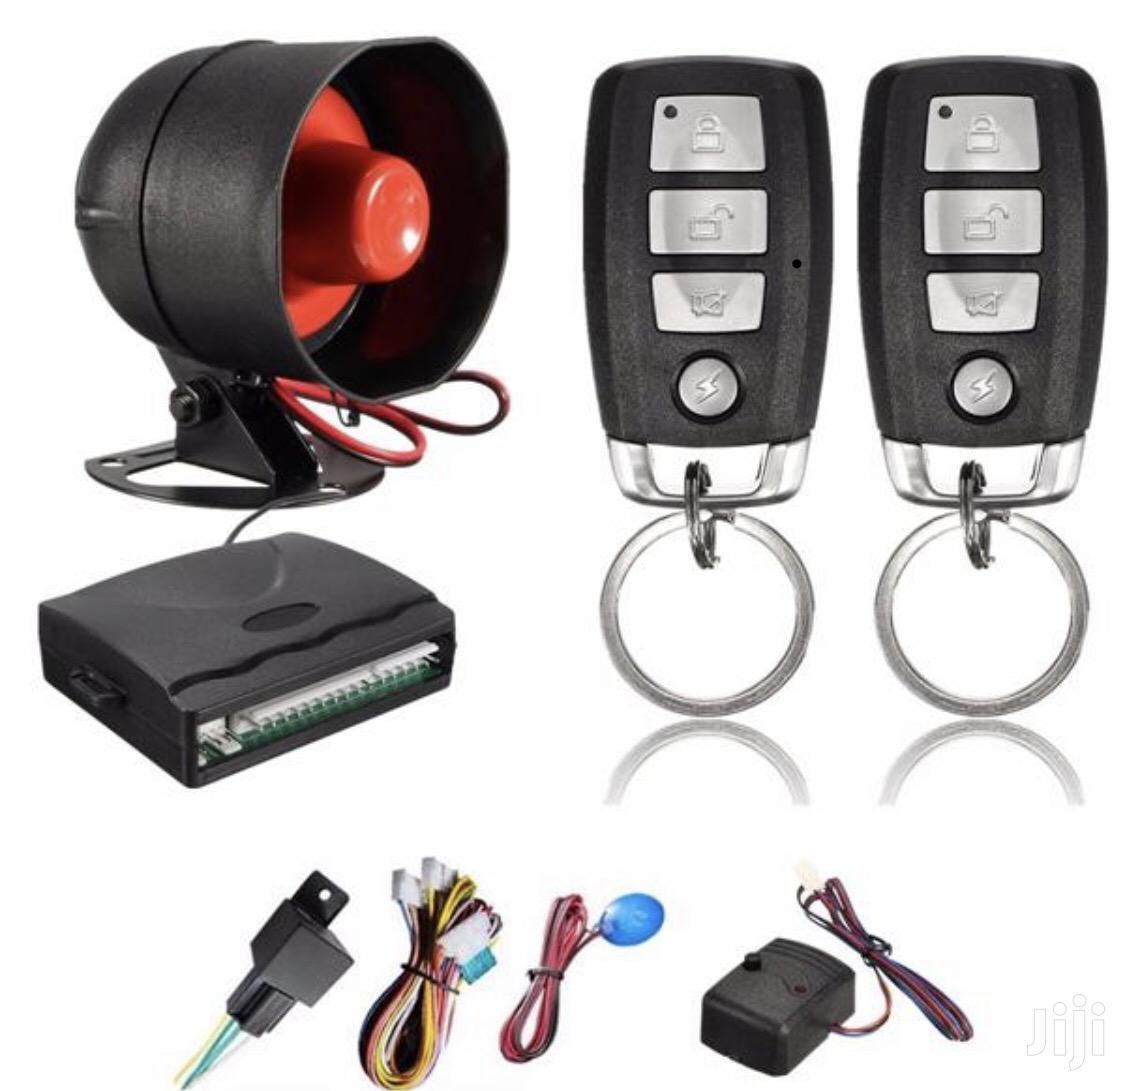 New 1 Way Car Alarm System